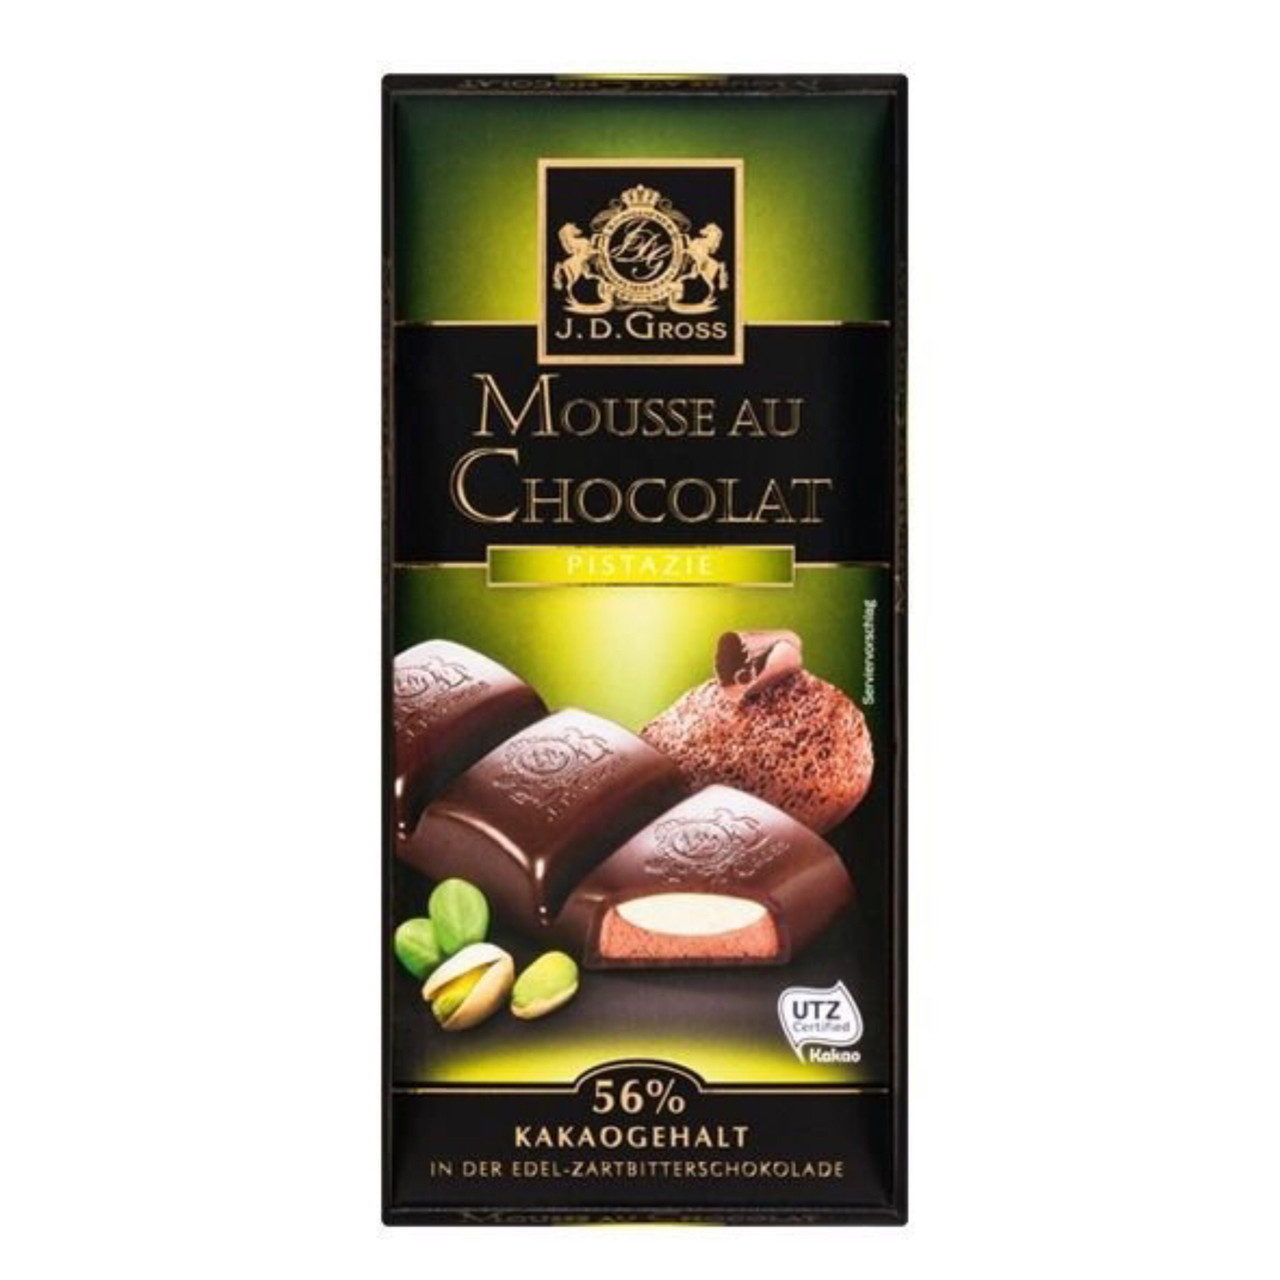 Шоколад J.D.Gross Mousse au Chocolat 182,5г